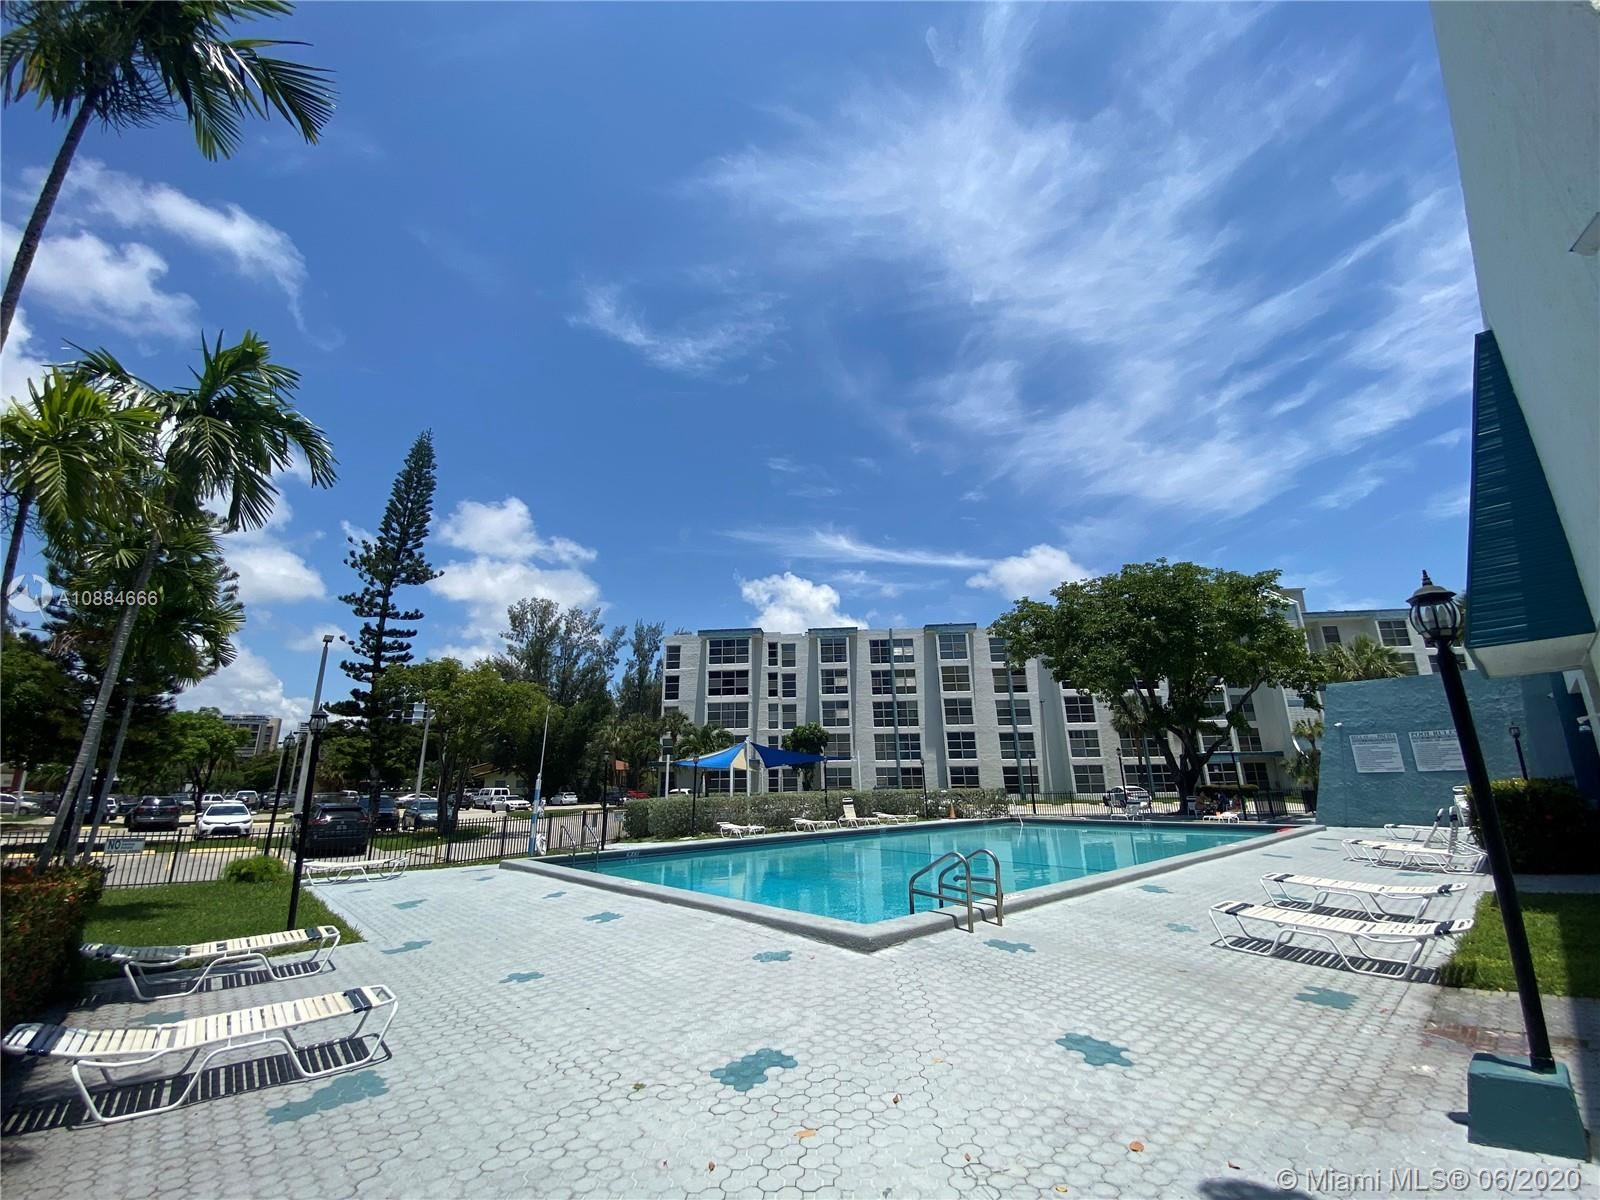 17620 Atlantic Blvd #501, Sunny Isles, FL 33160 - #: A10884666